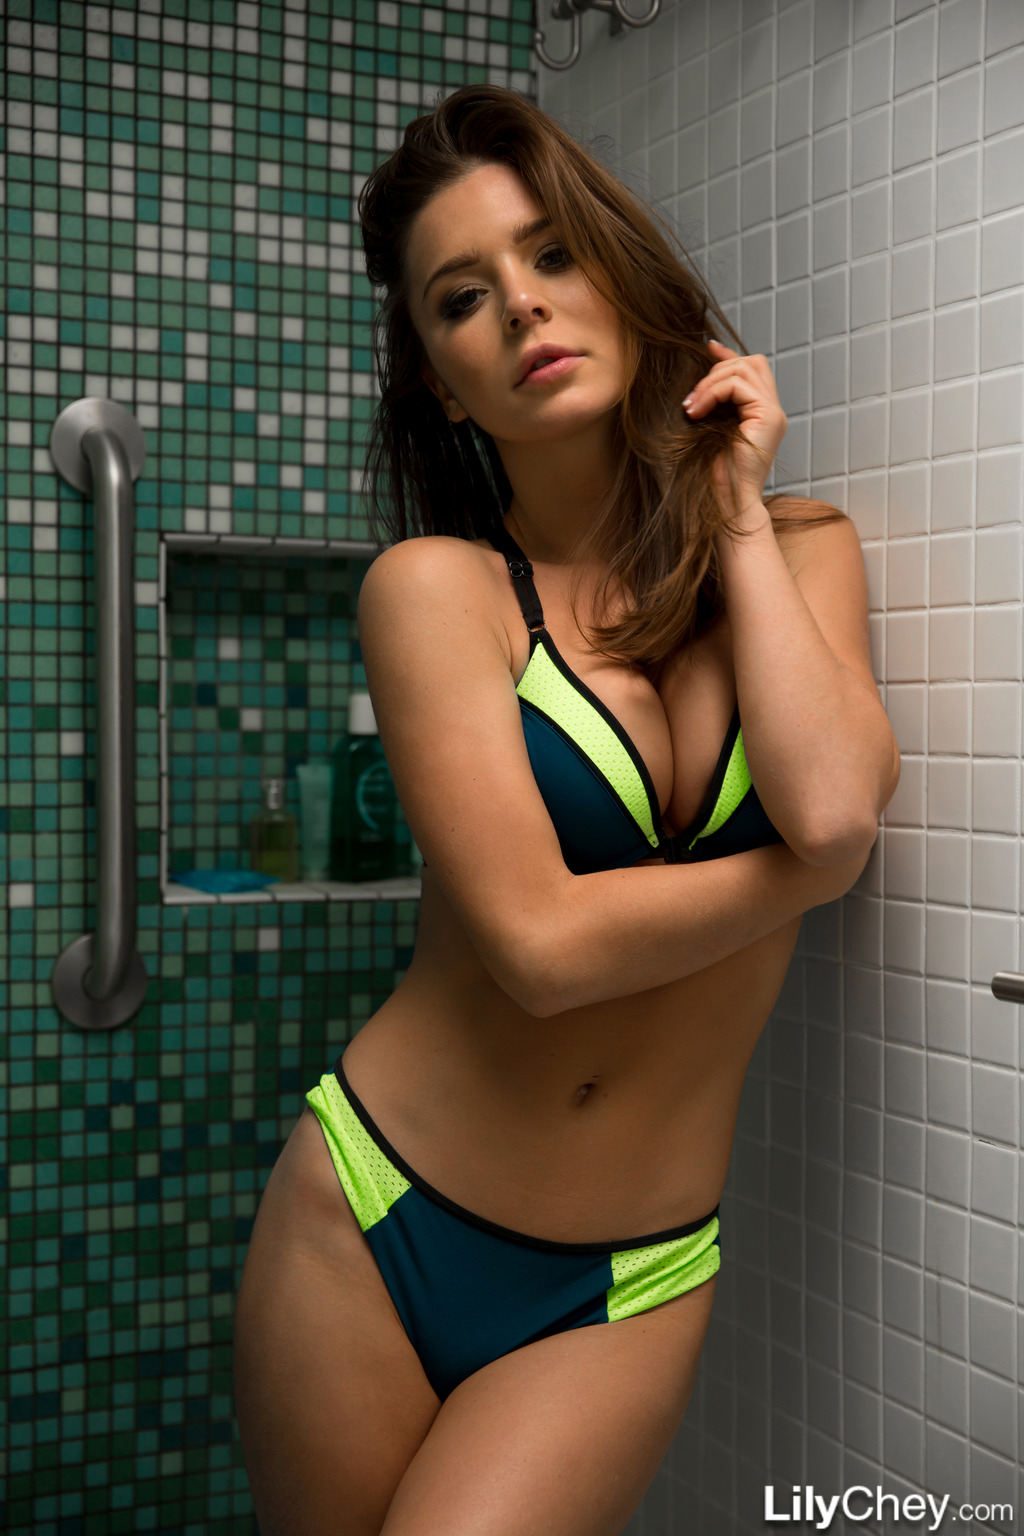 Lily Chey In Bikini Shower 07